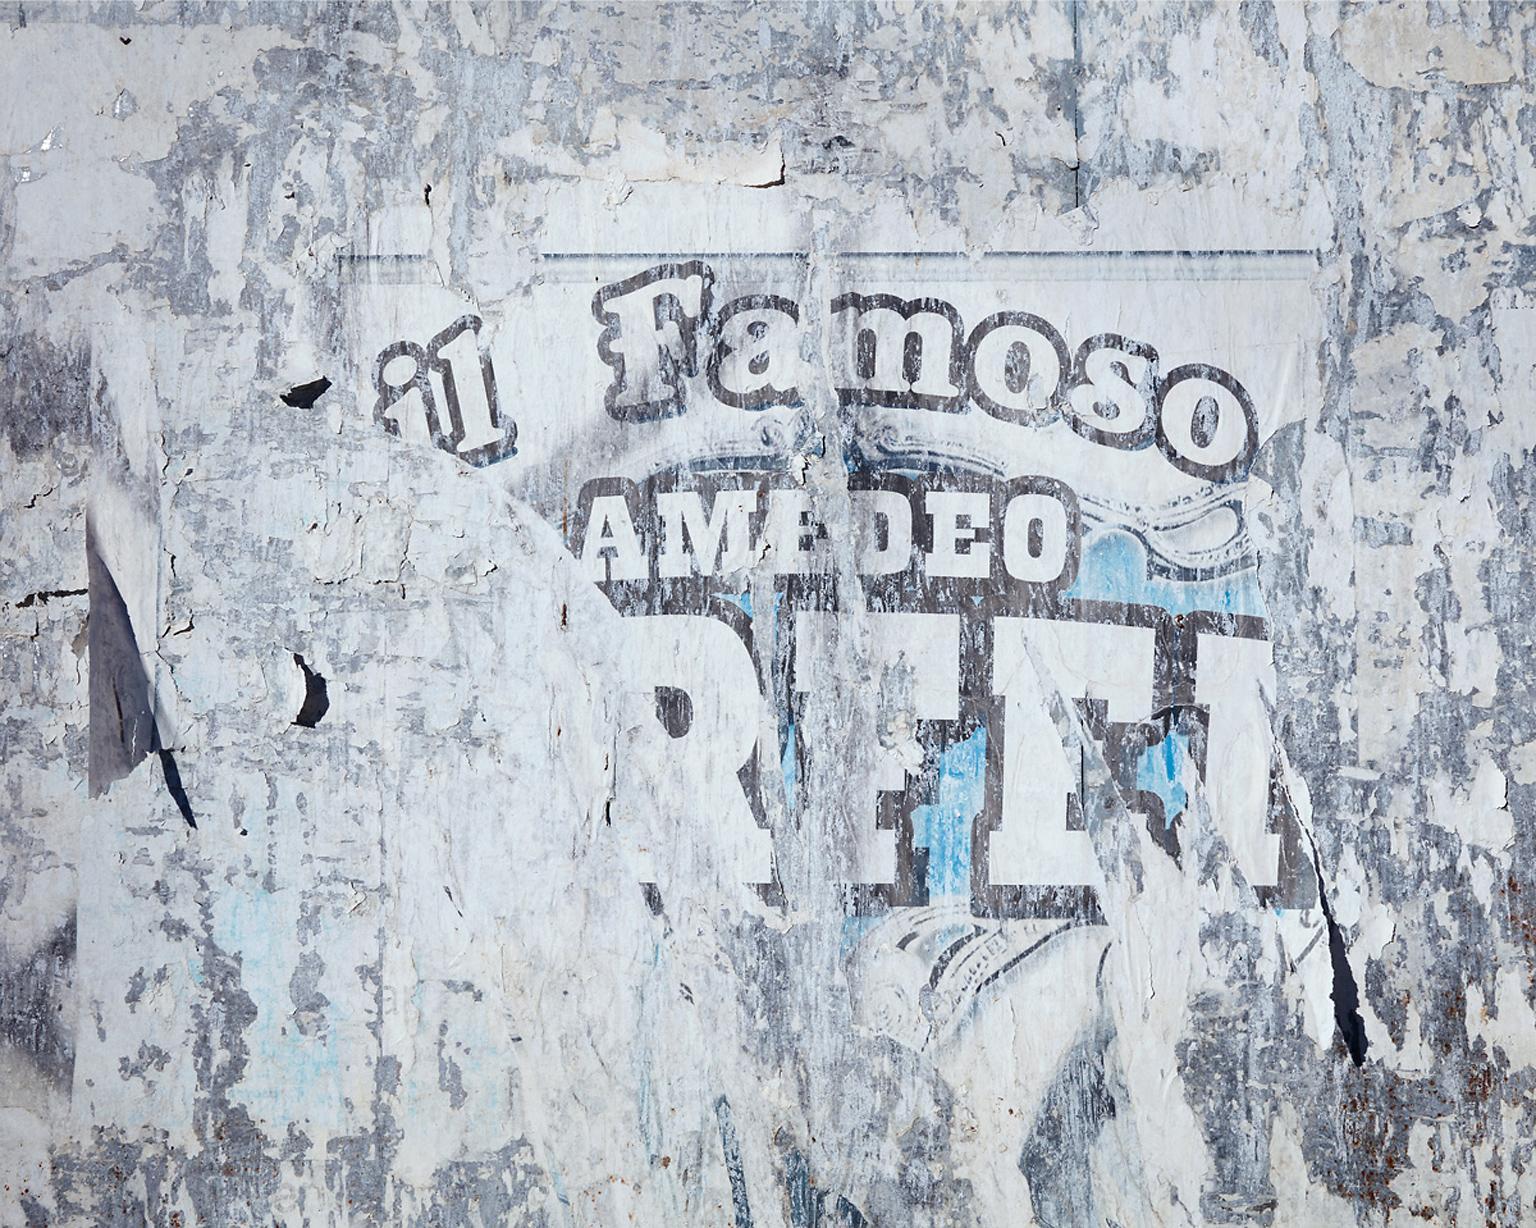 Wallscape VI (Il Famoso) - abstract capture of vintage Italian circus poster